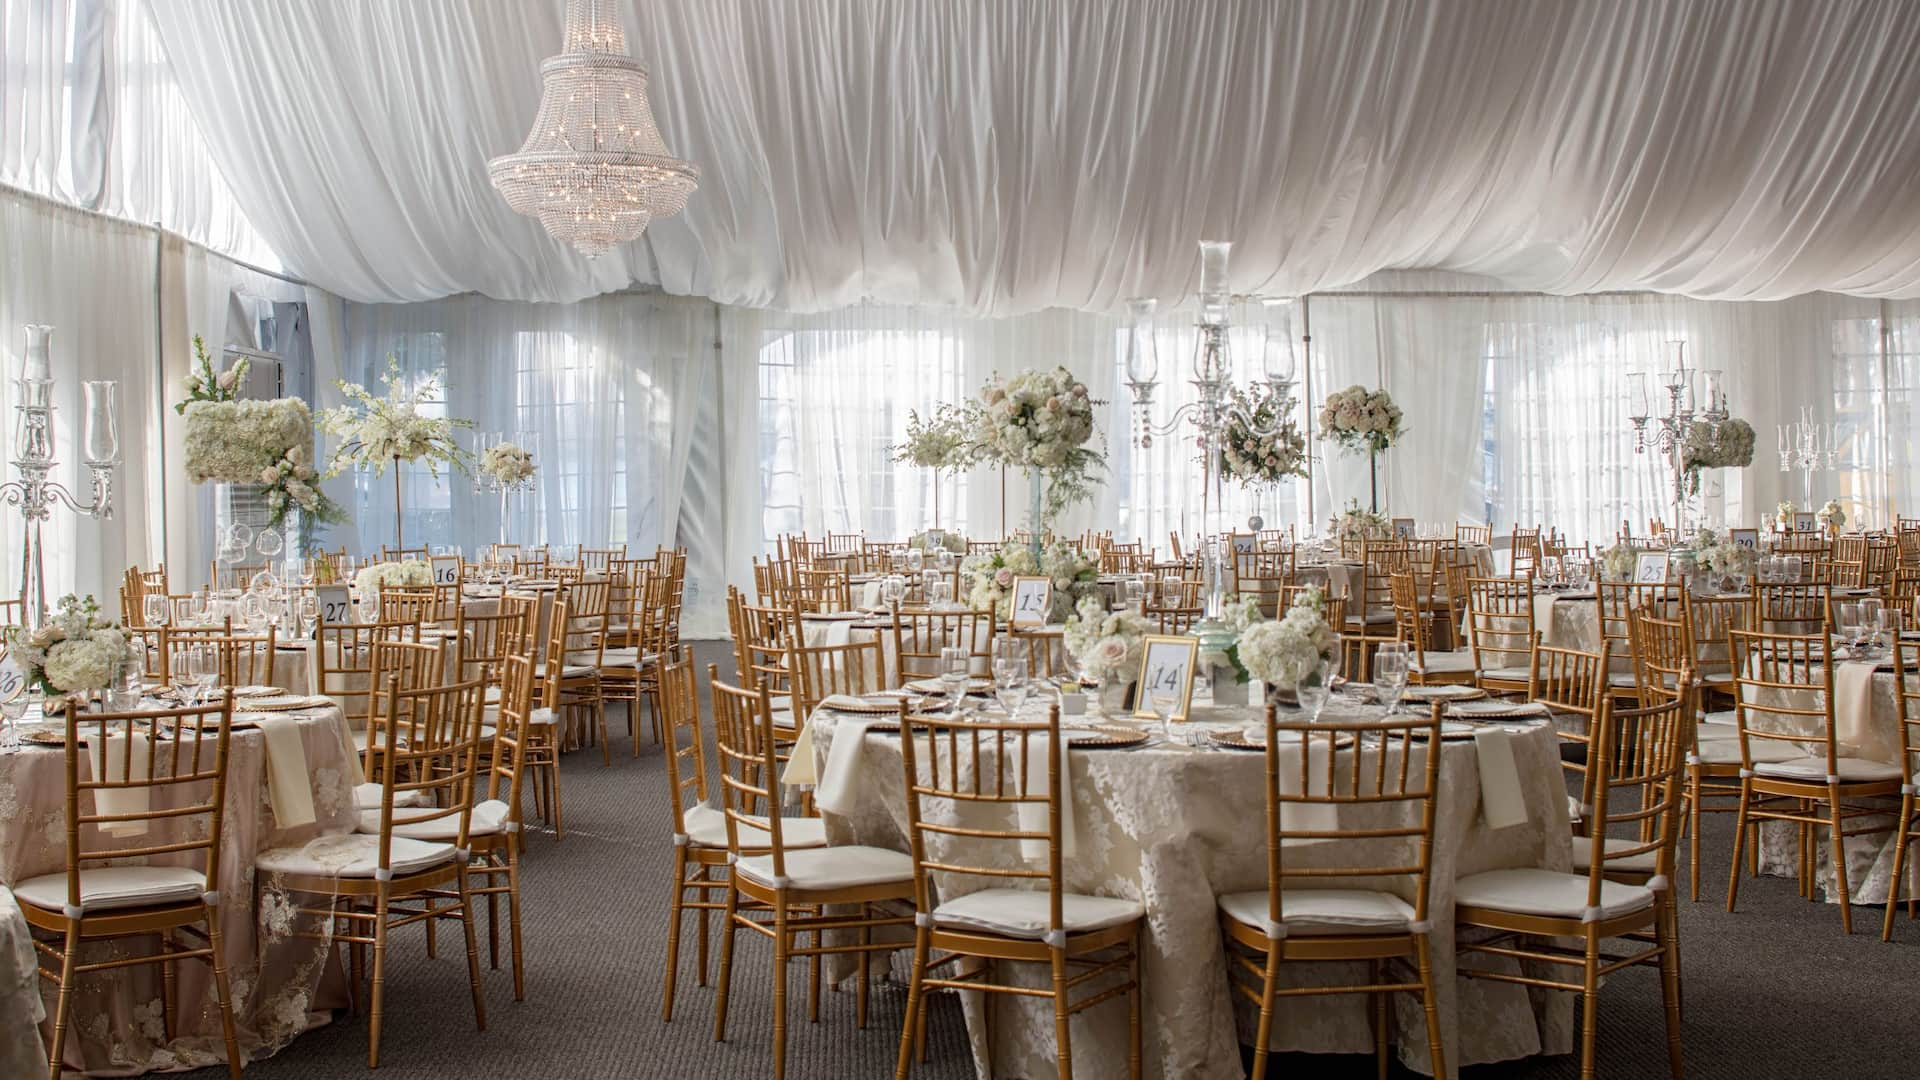 Pavilion Wedding Daylight Tables